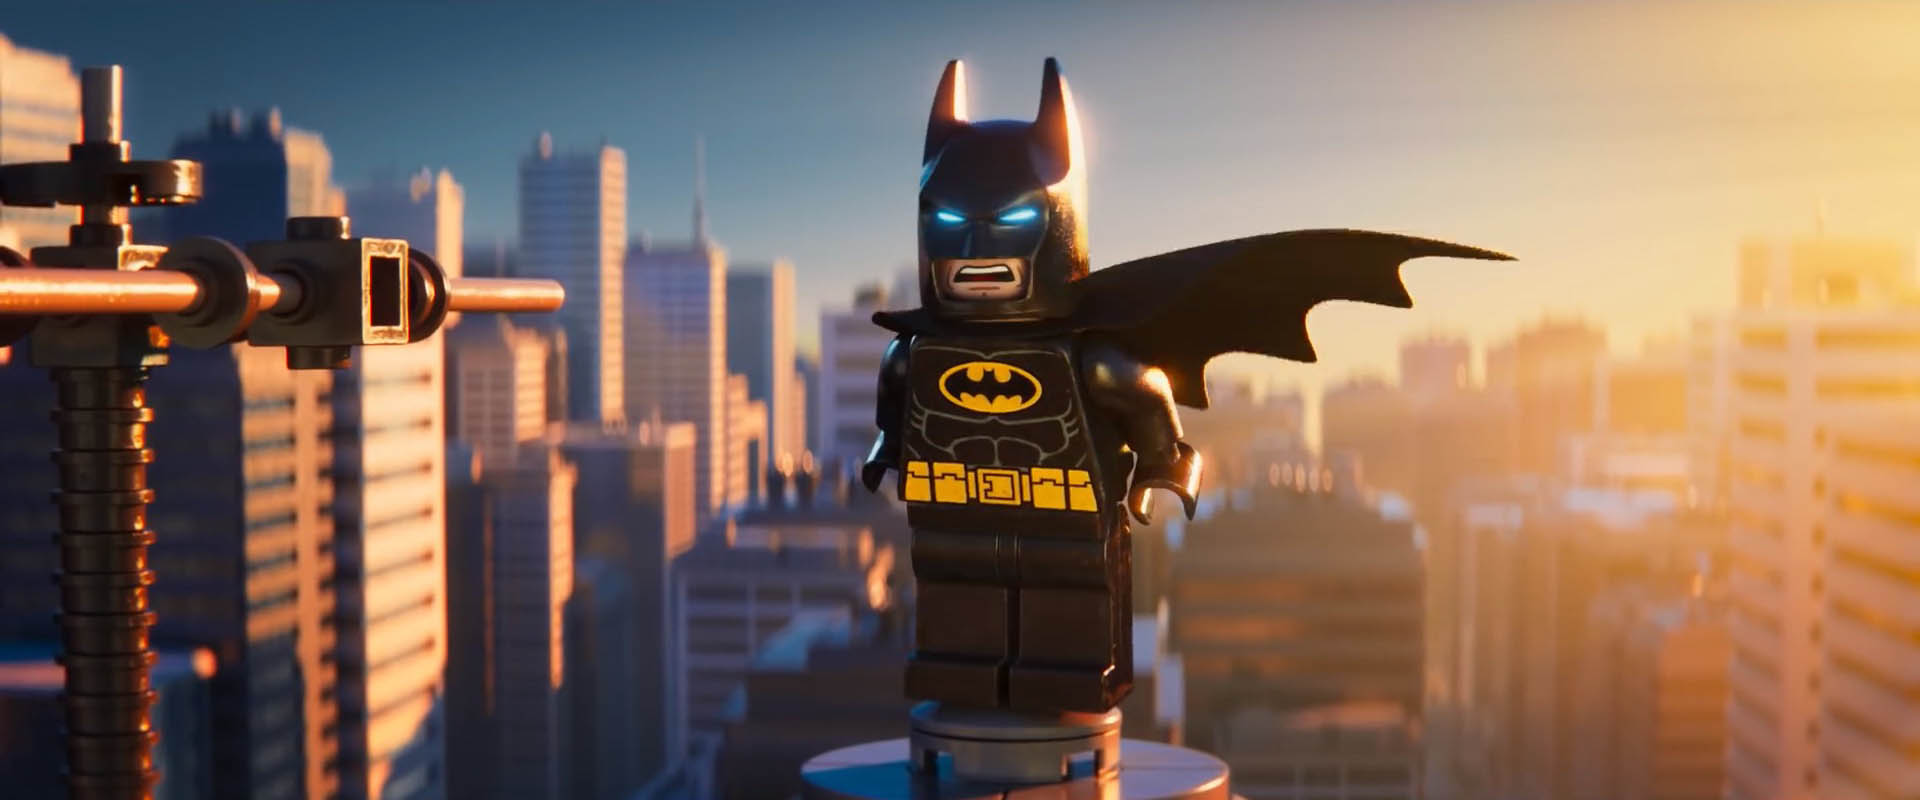 Lego Movie 2 Trailer Batman News